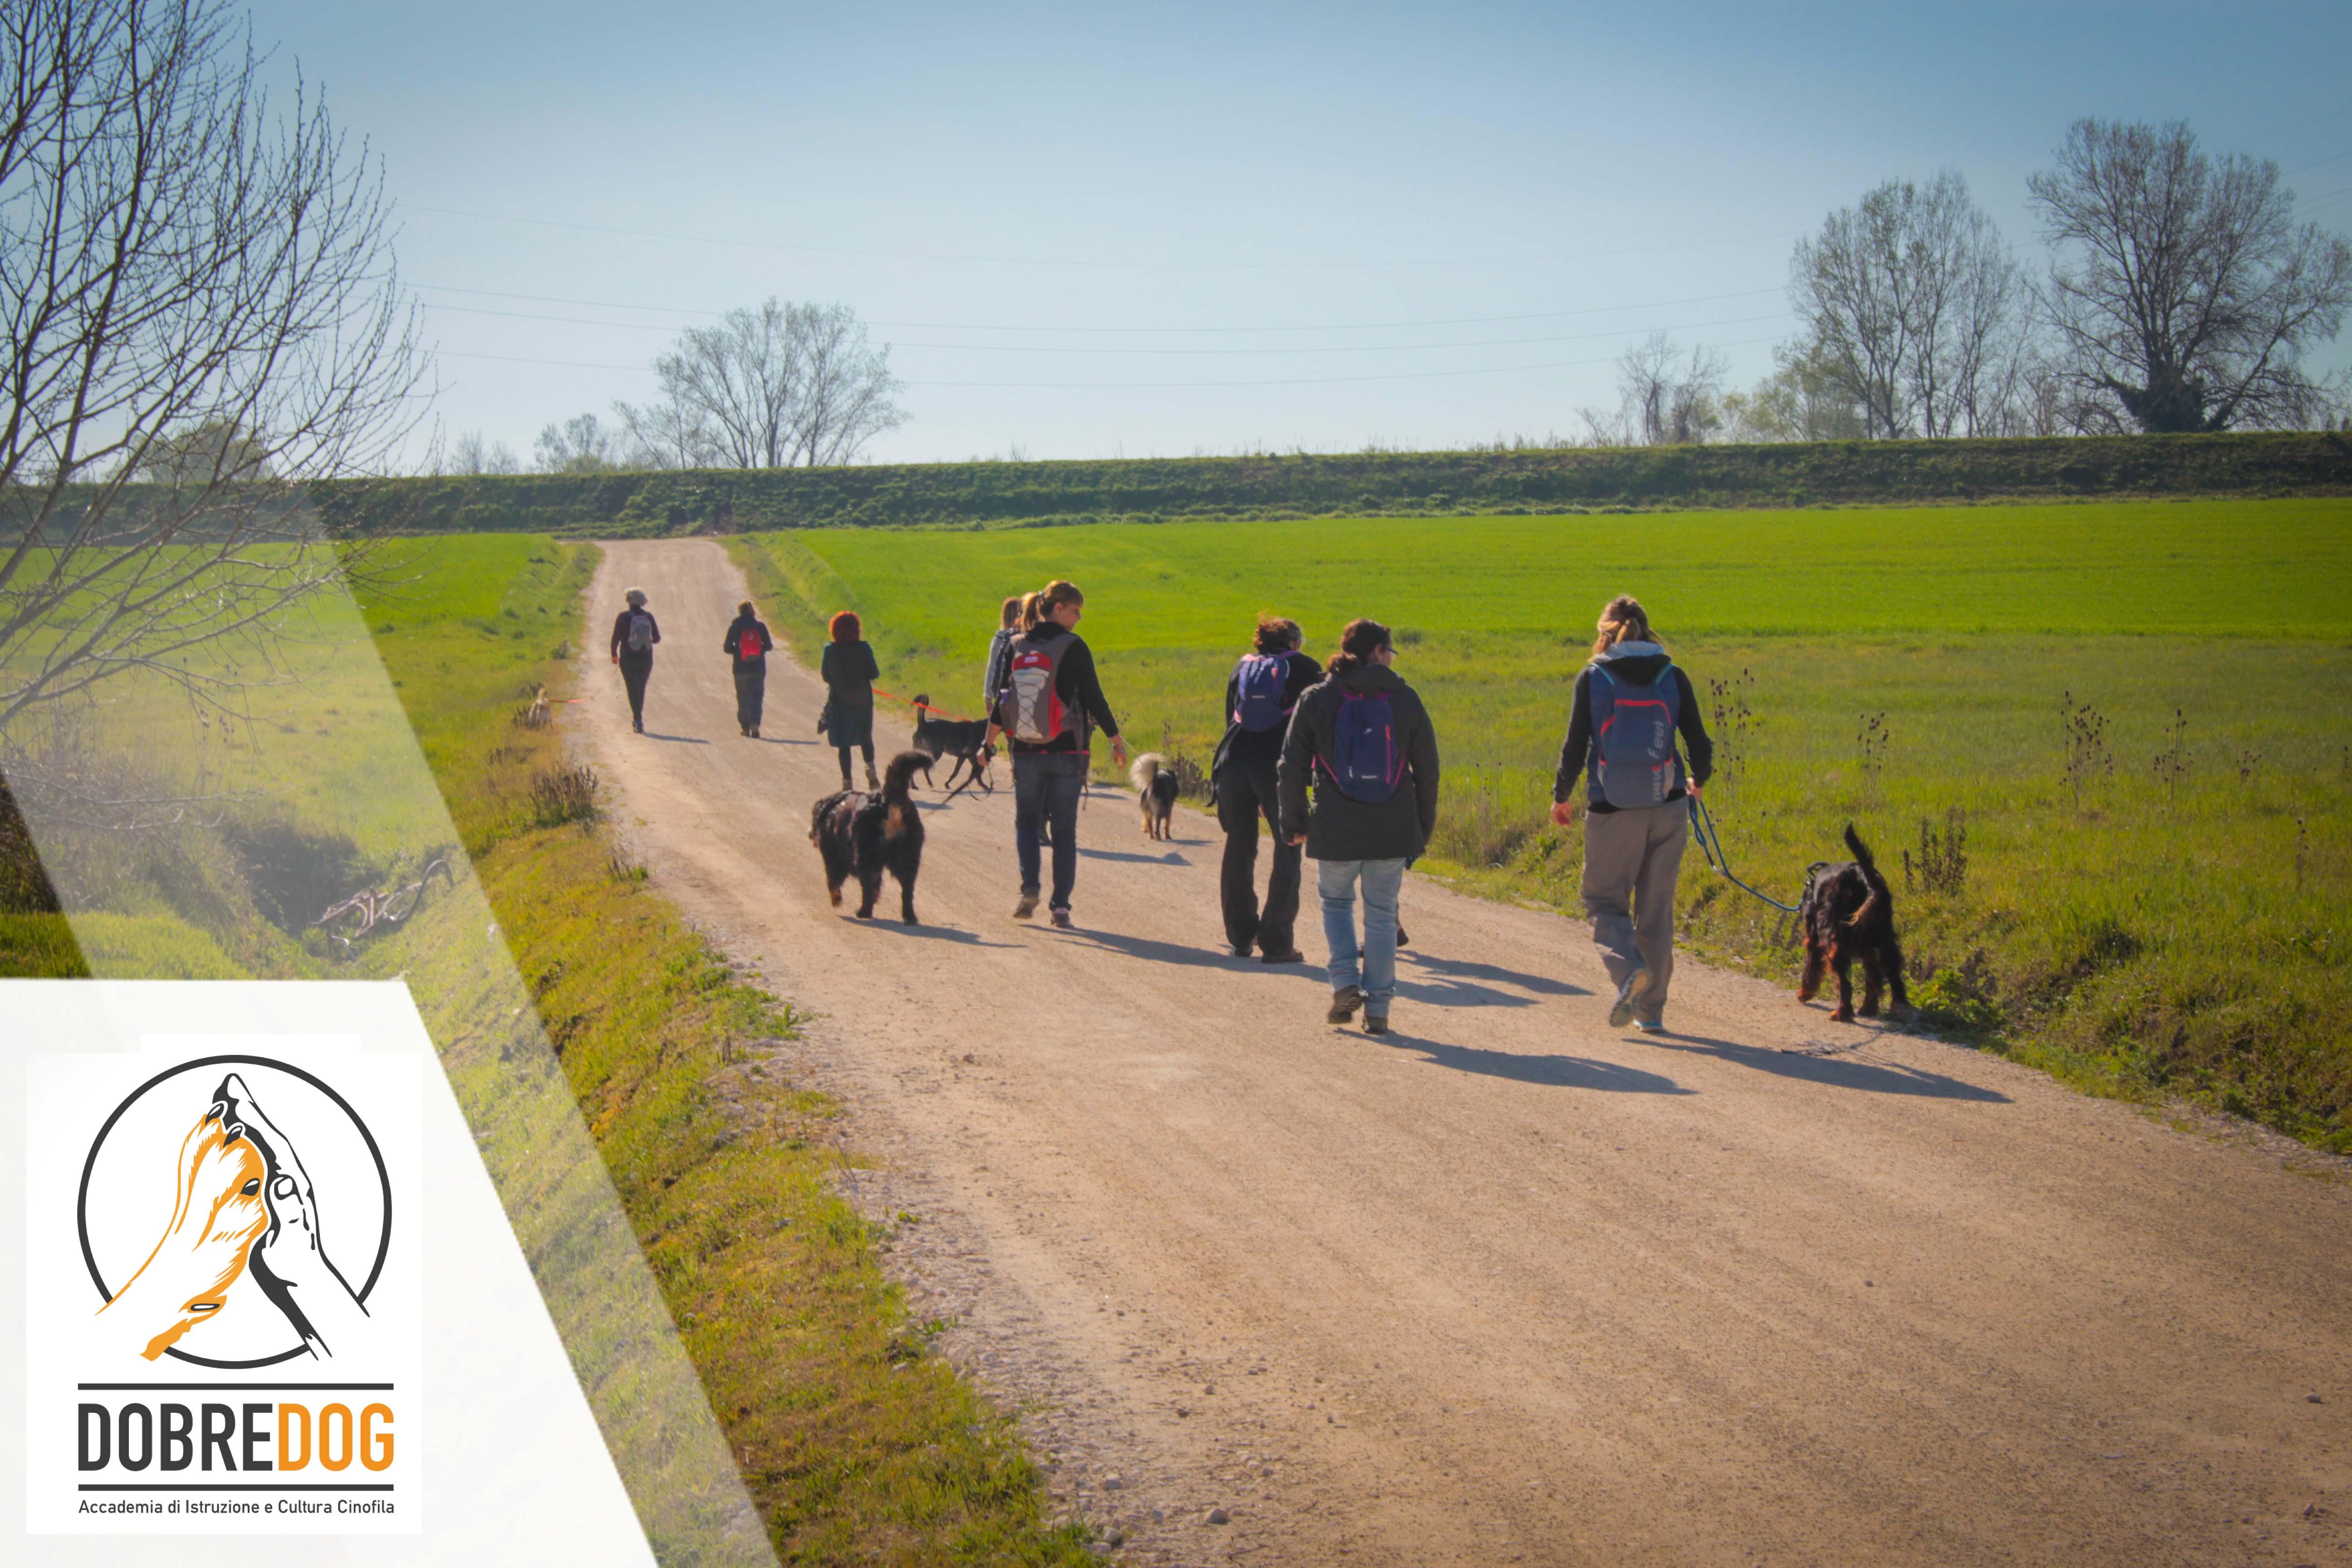 Dog Trekking - Centro Cinofilo Dobredog